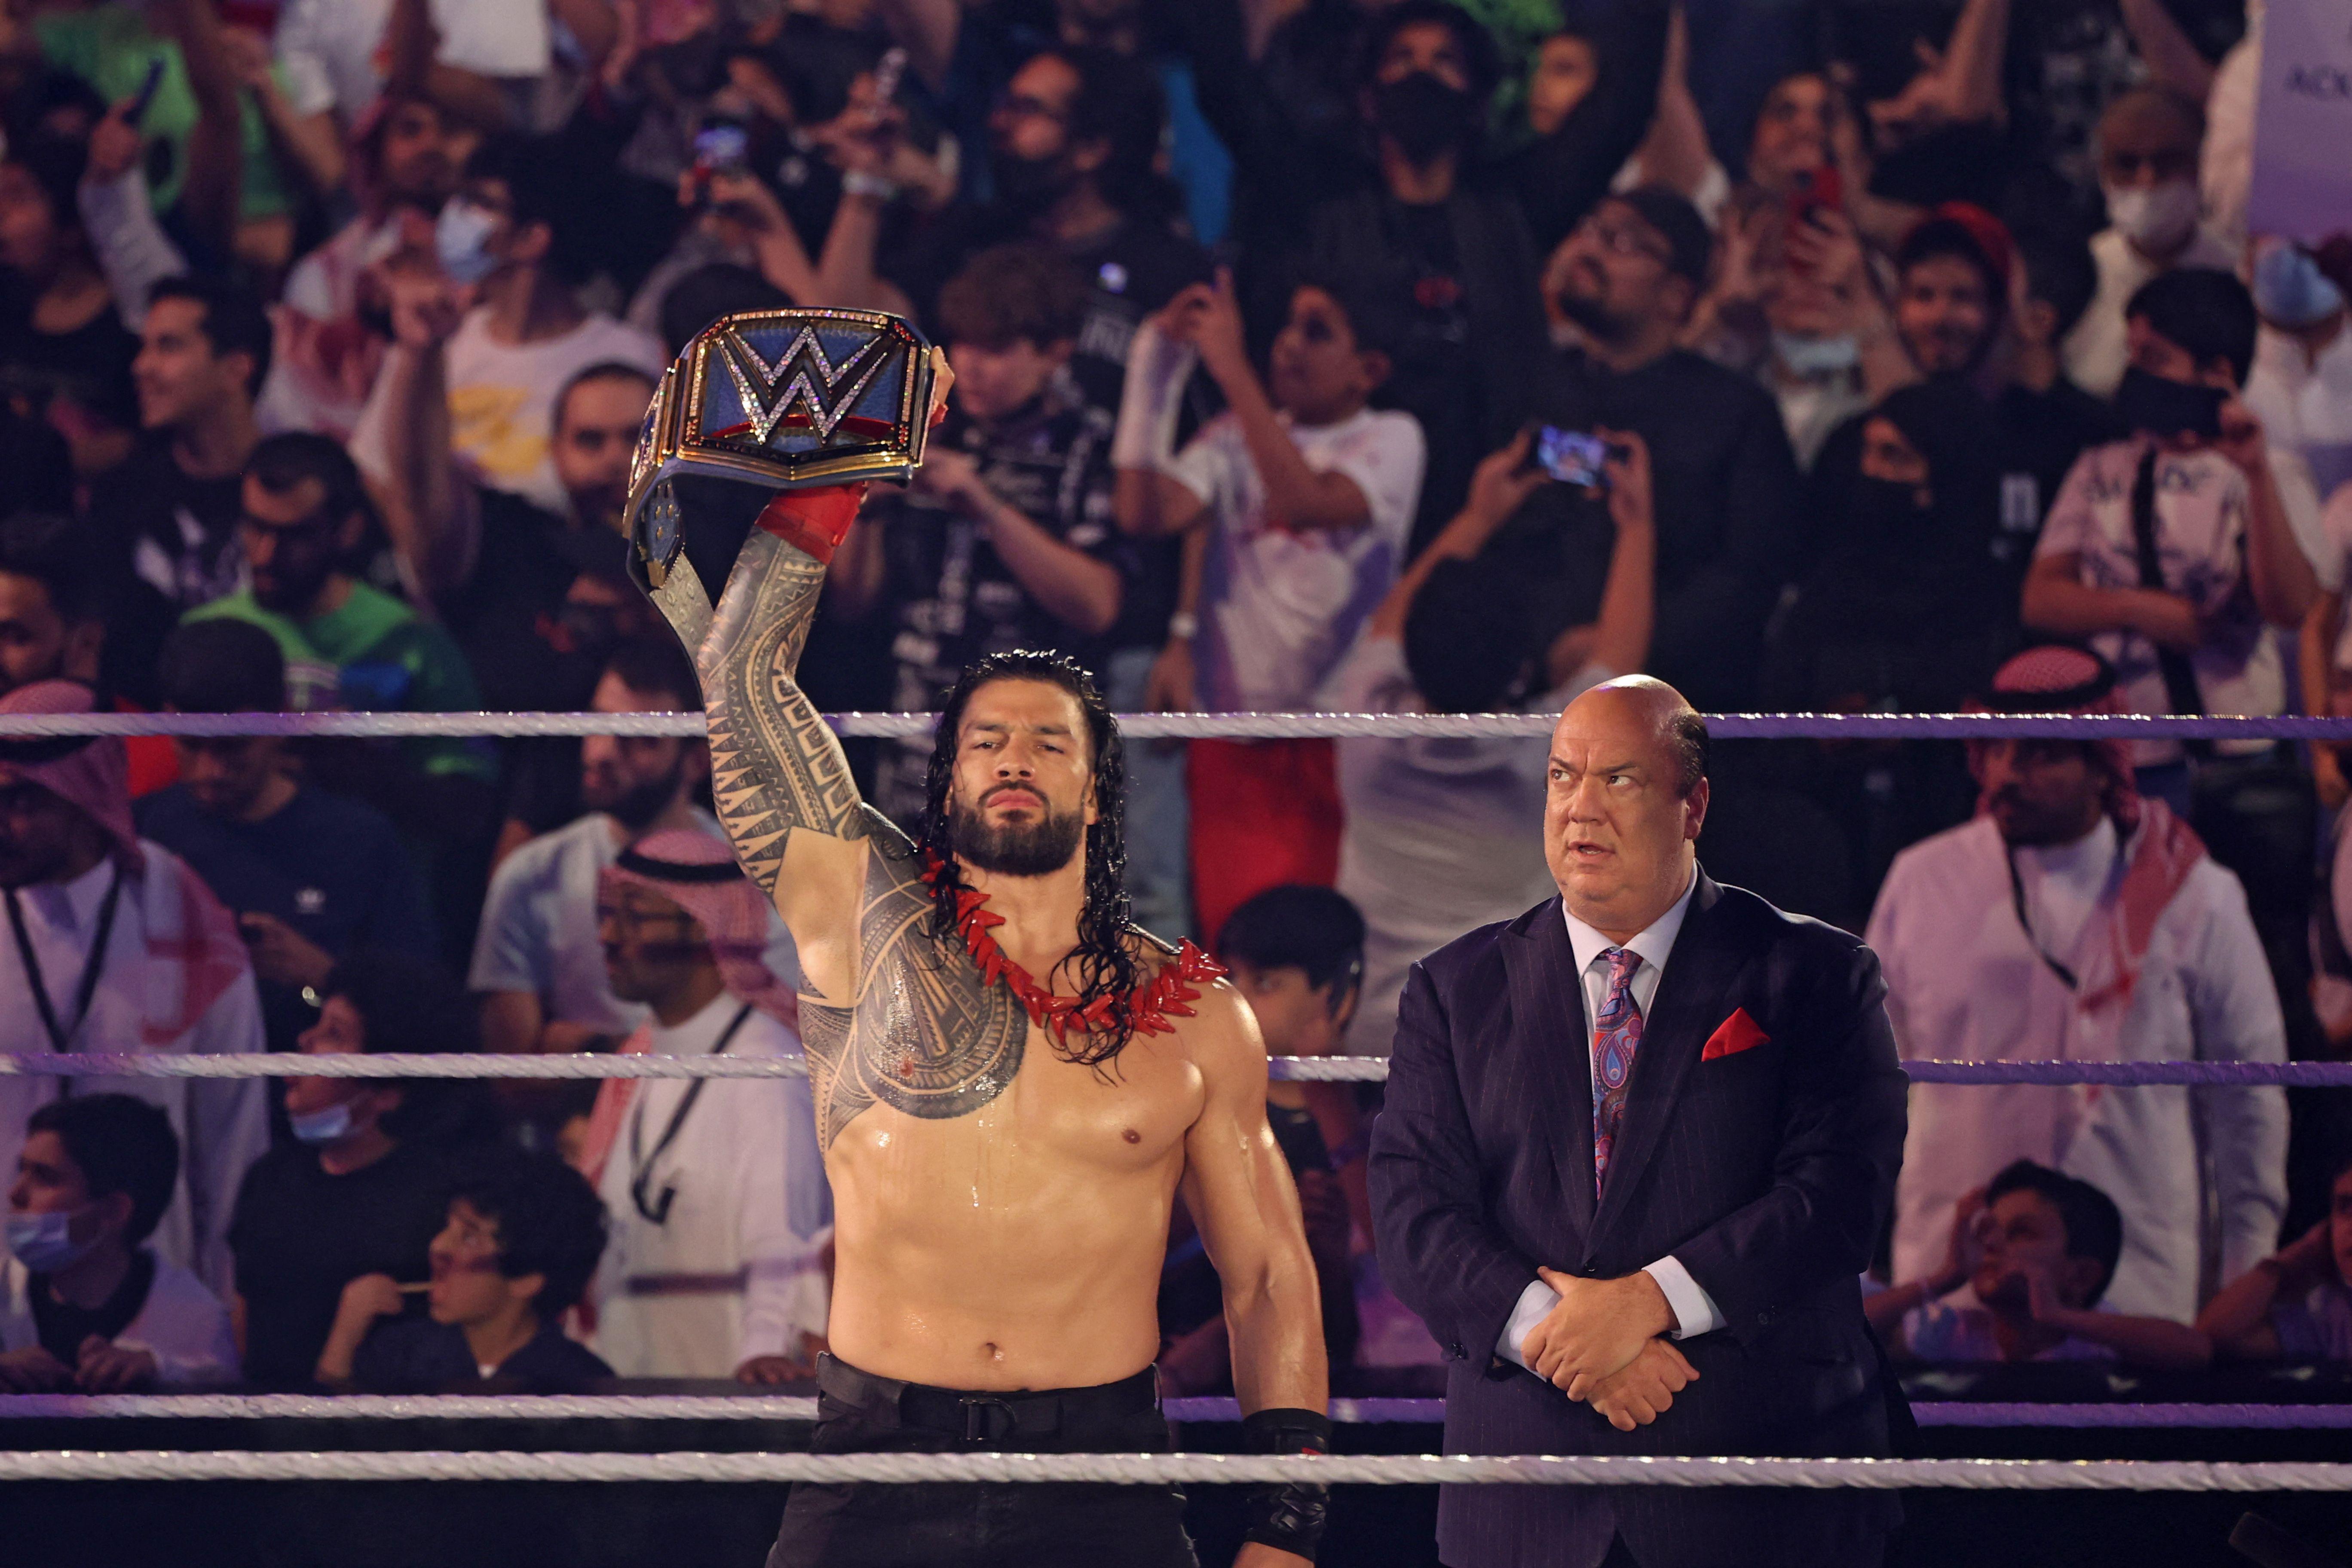 WWE Rumors on Roman Reigns, Bryan Danielson, Charlotte, Bray Wyatt, Braun Strowman thumbnail